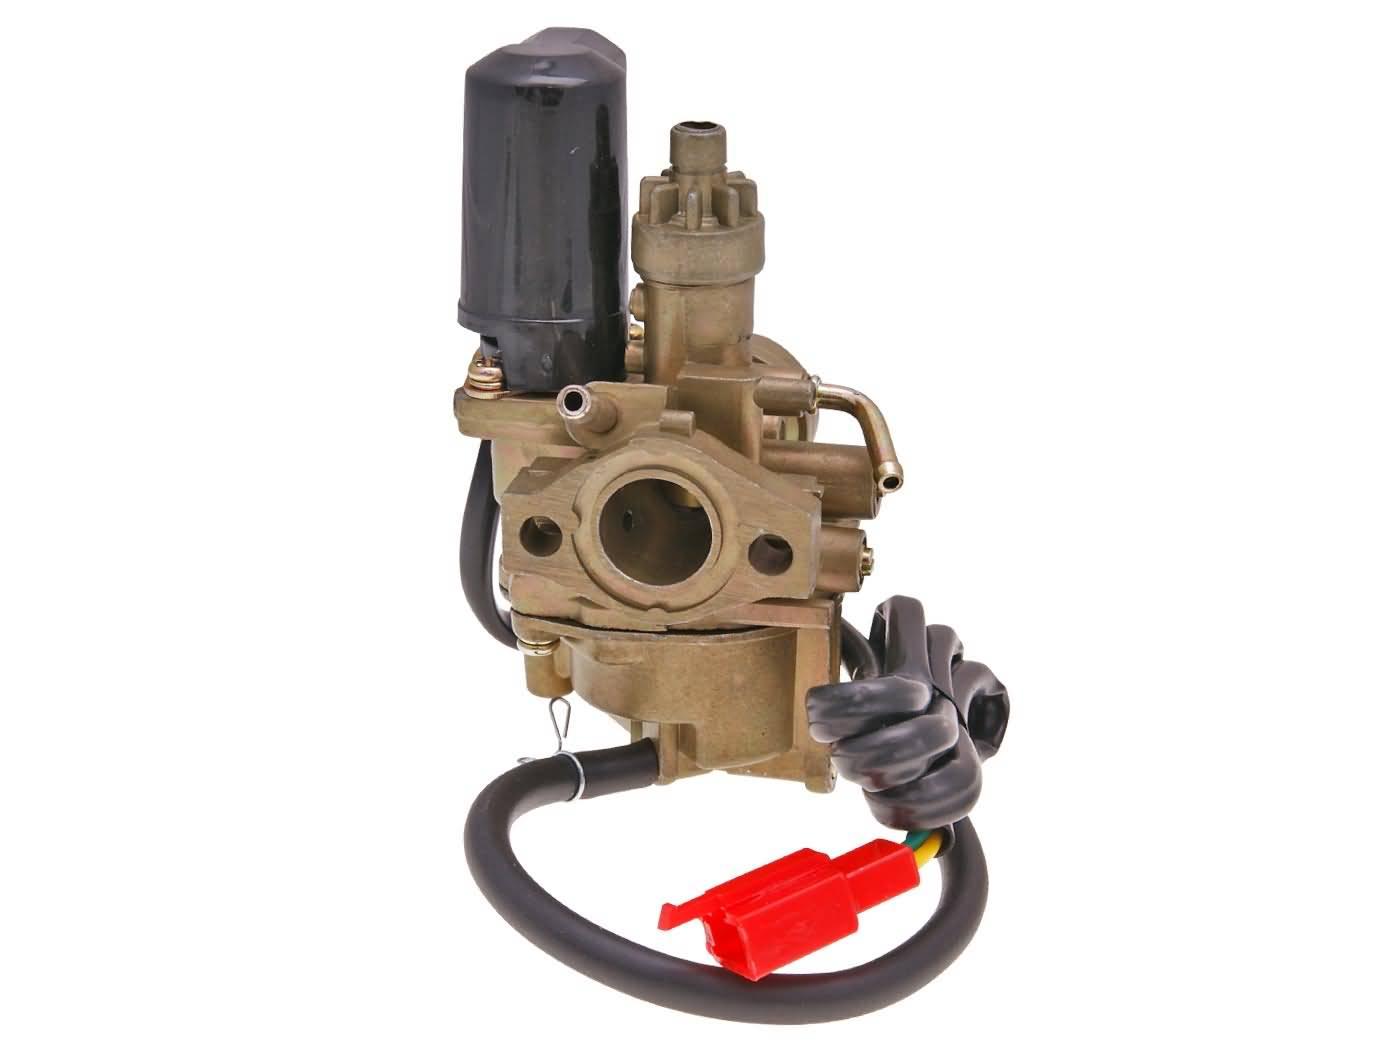 KR Vergaser Reparatur Satz YAMAHA YFM 600 Grizzly 98-99 Carburetor Repair